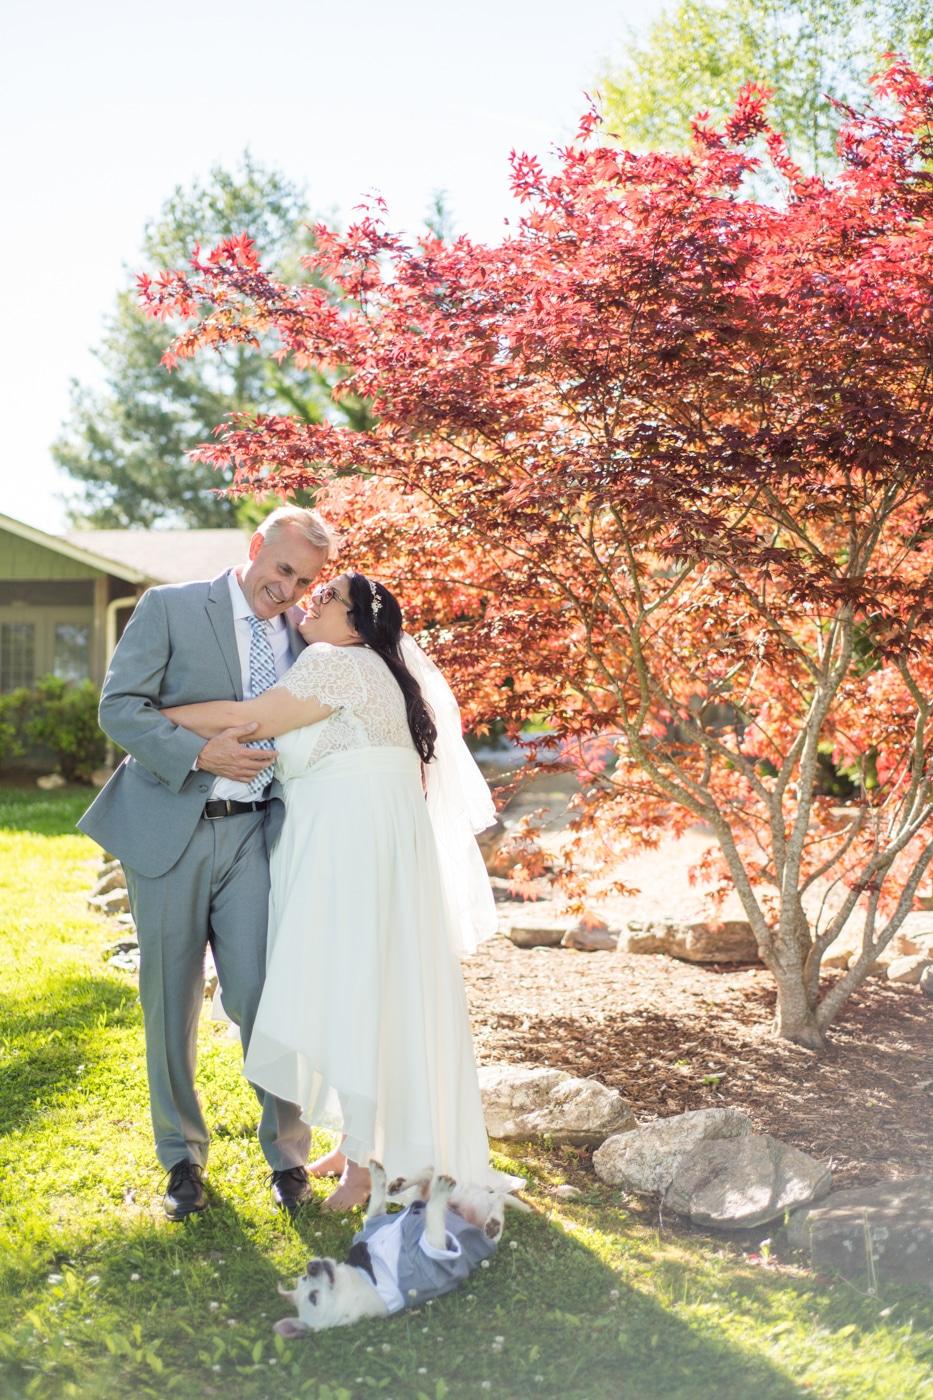 bride and groom hug by red tree before Lake Blue Ridge wedding day